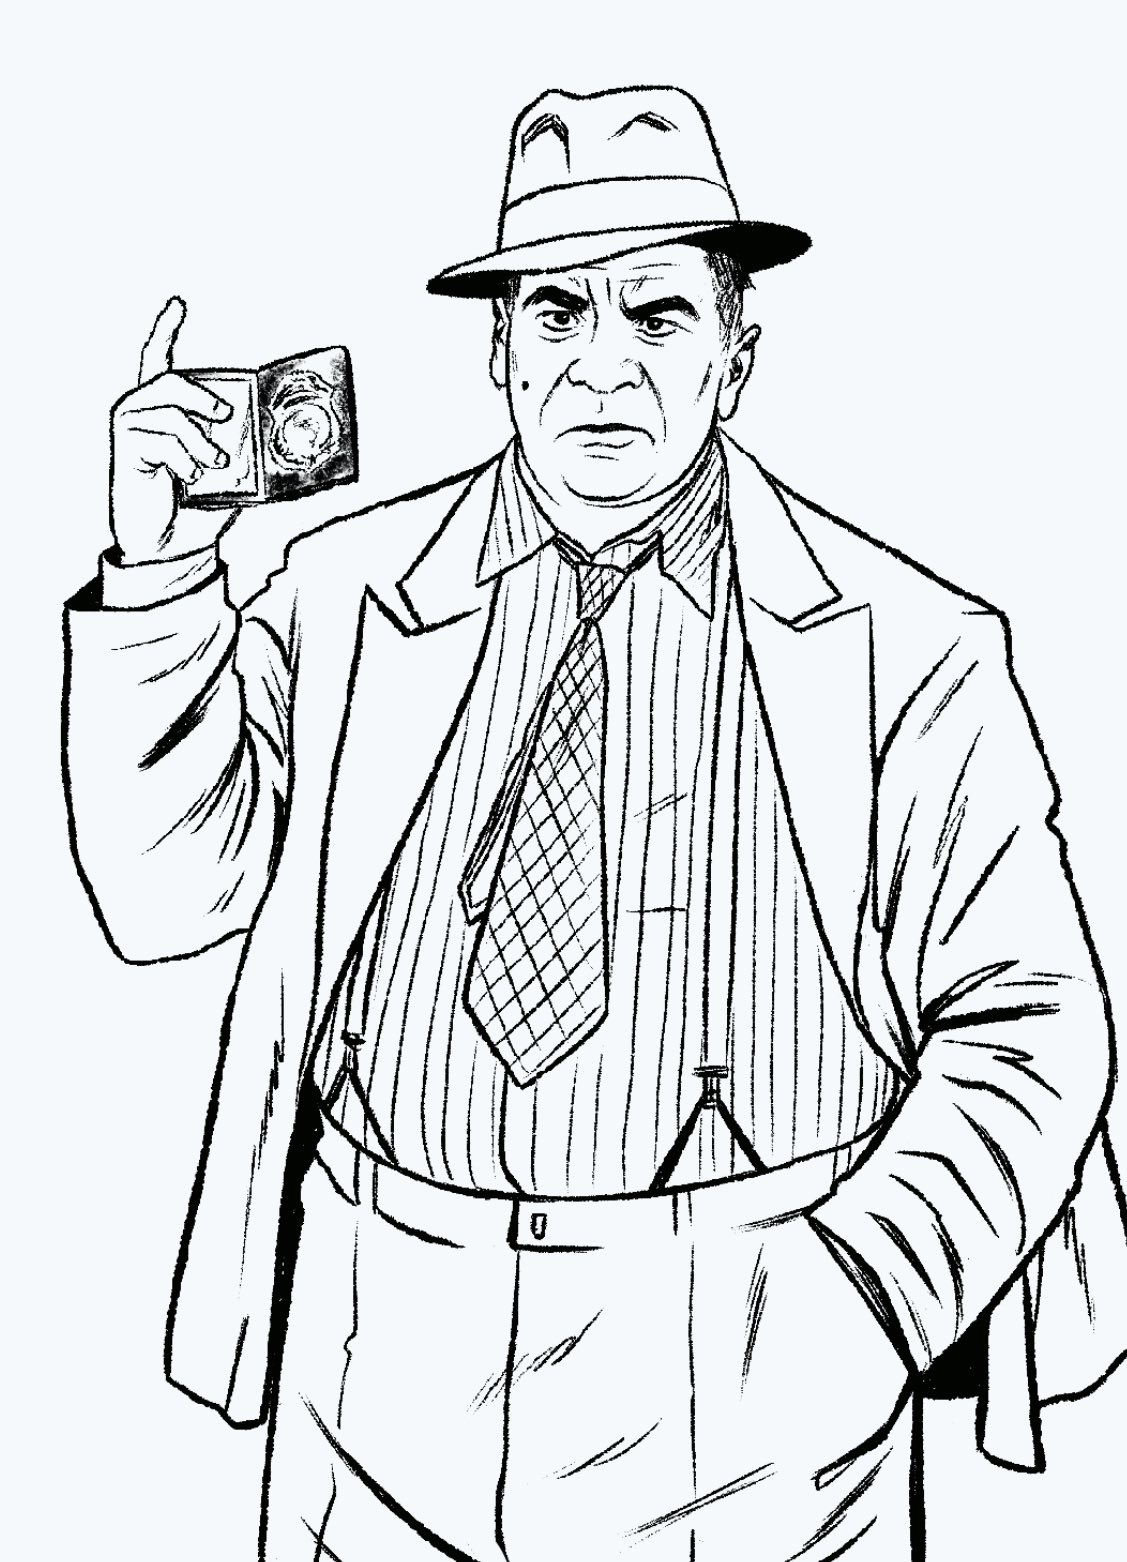 El Detective Harvey Bullock en Batman '89 (2021). Arte por Joe Quiñones. Imagen: Joe Quiñones Twitter (@Joe_Quinones).